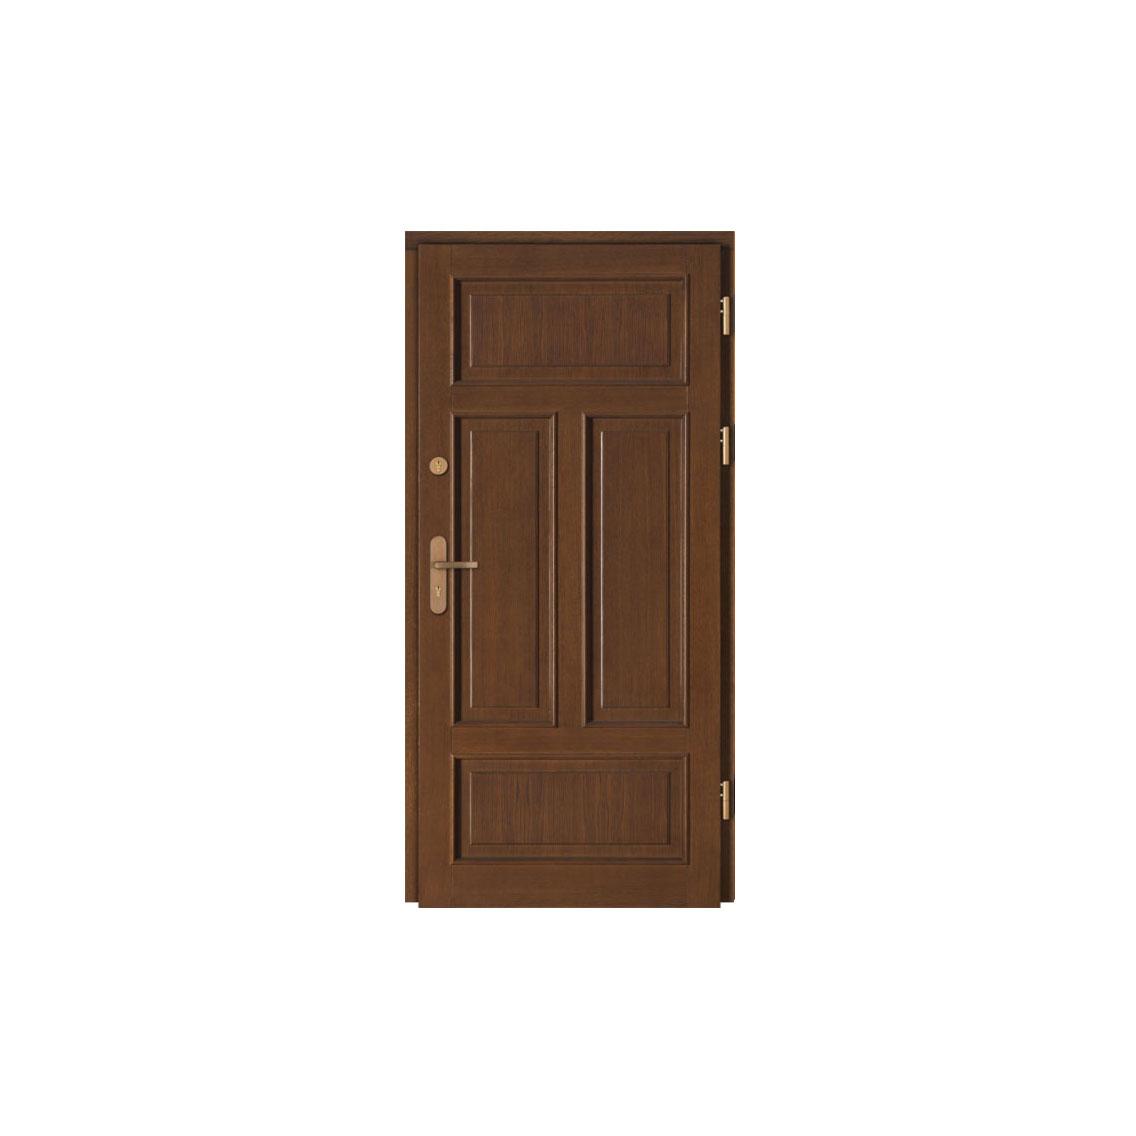 Koka durvis WD-16